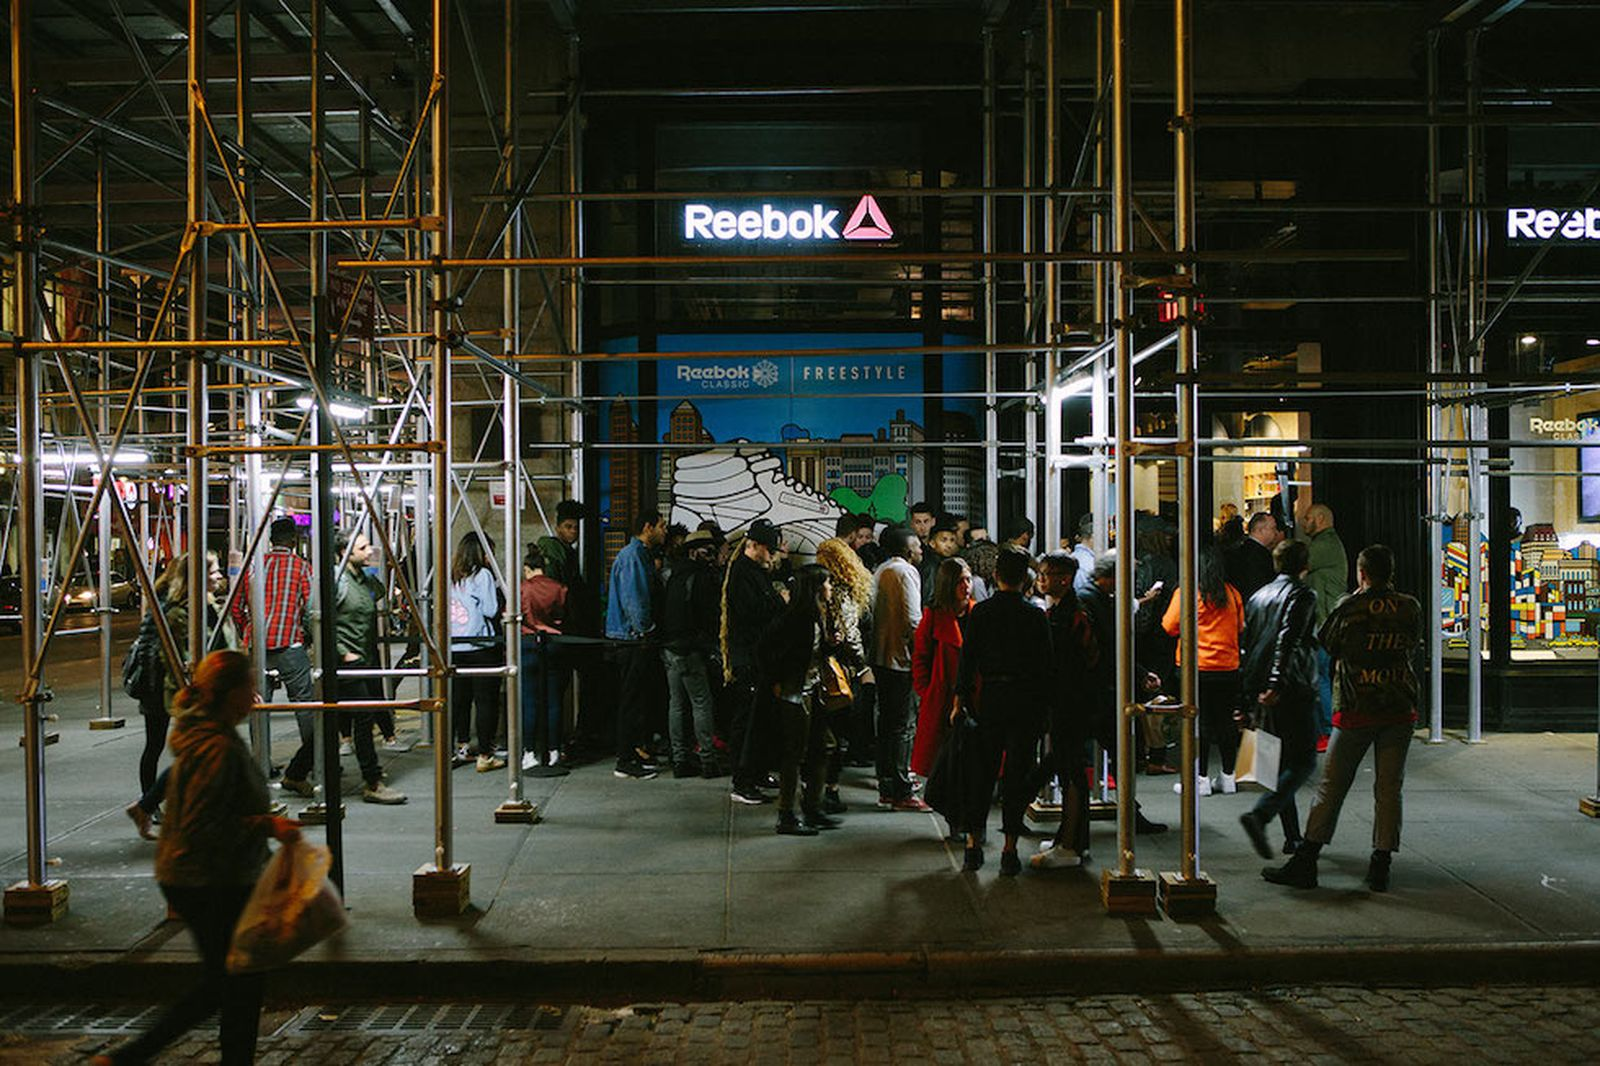 reebok-freestyle-5411-party-union-square-12